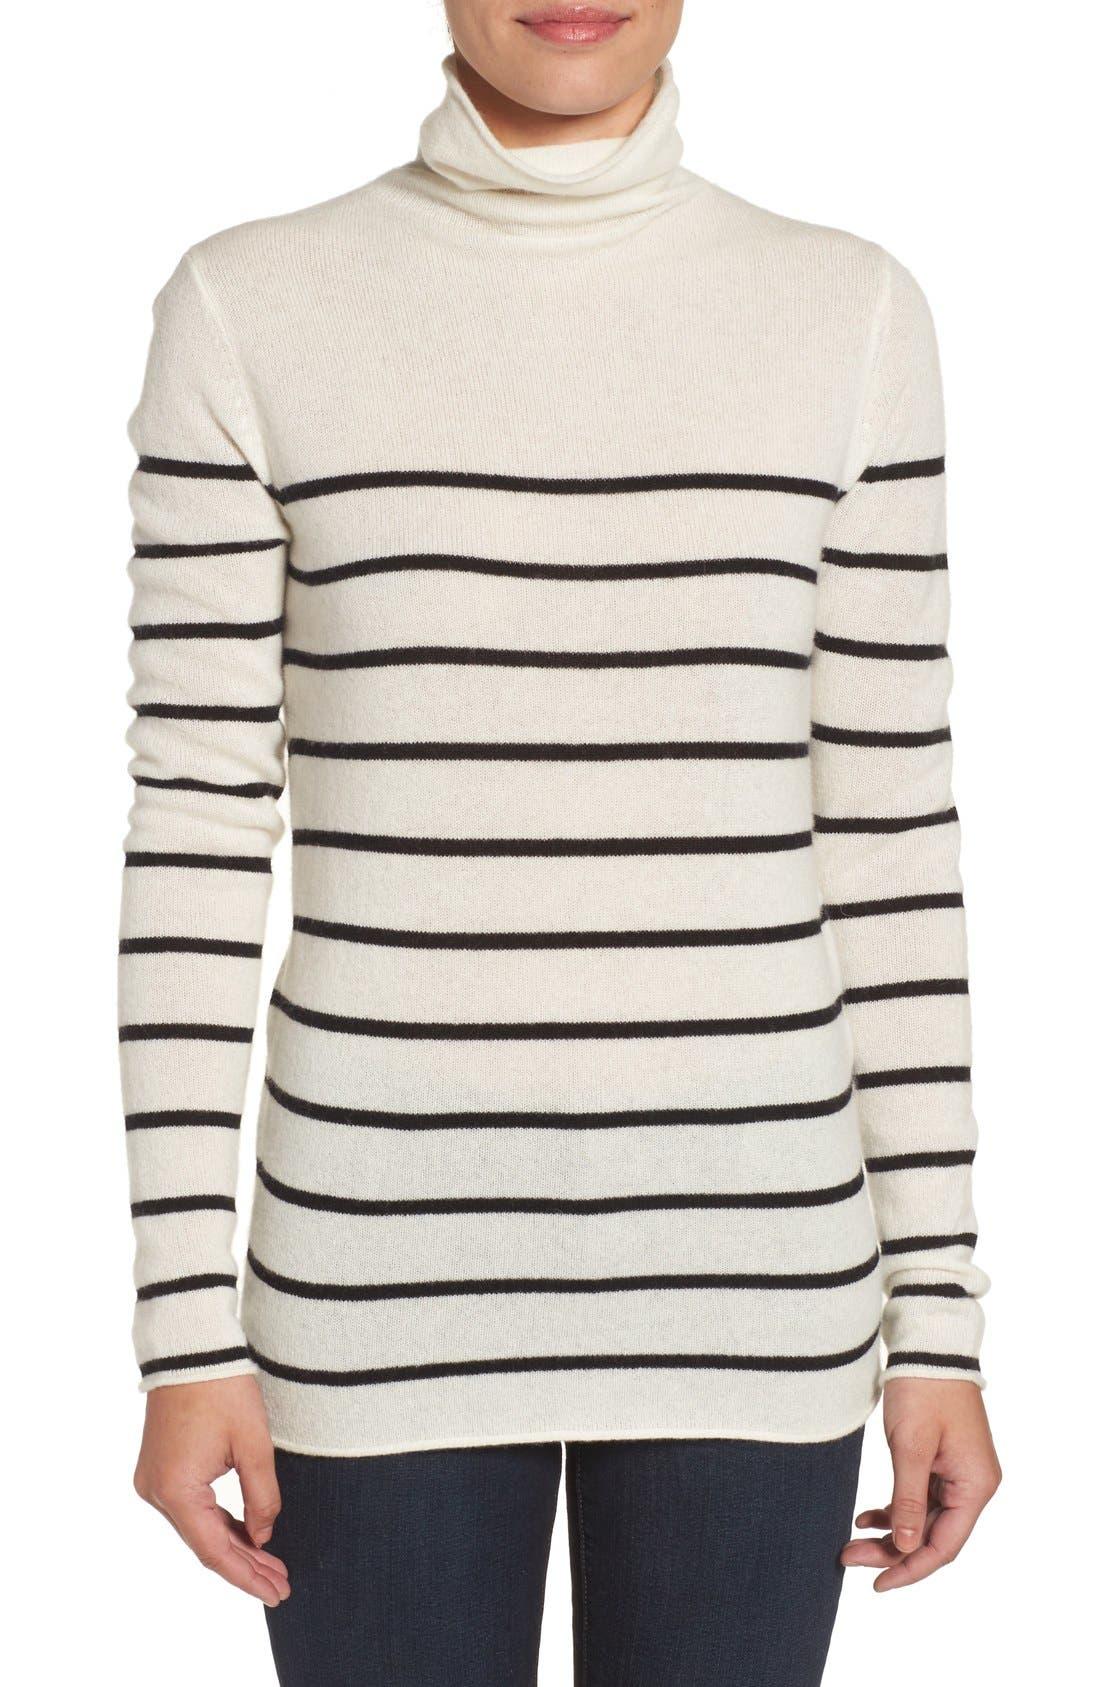 Alternate Image 1 Selected - Halogen® Wool & Cashmere Funnel Neck Sweater